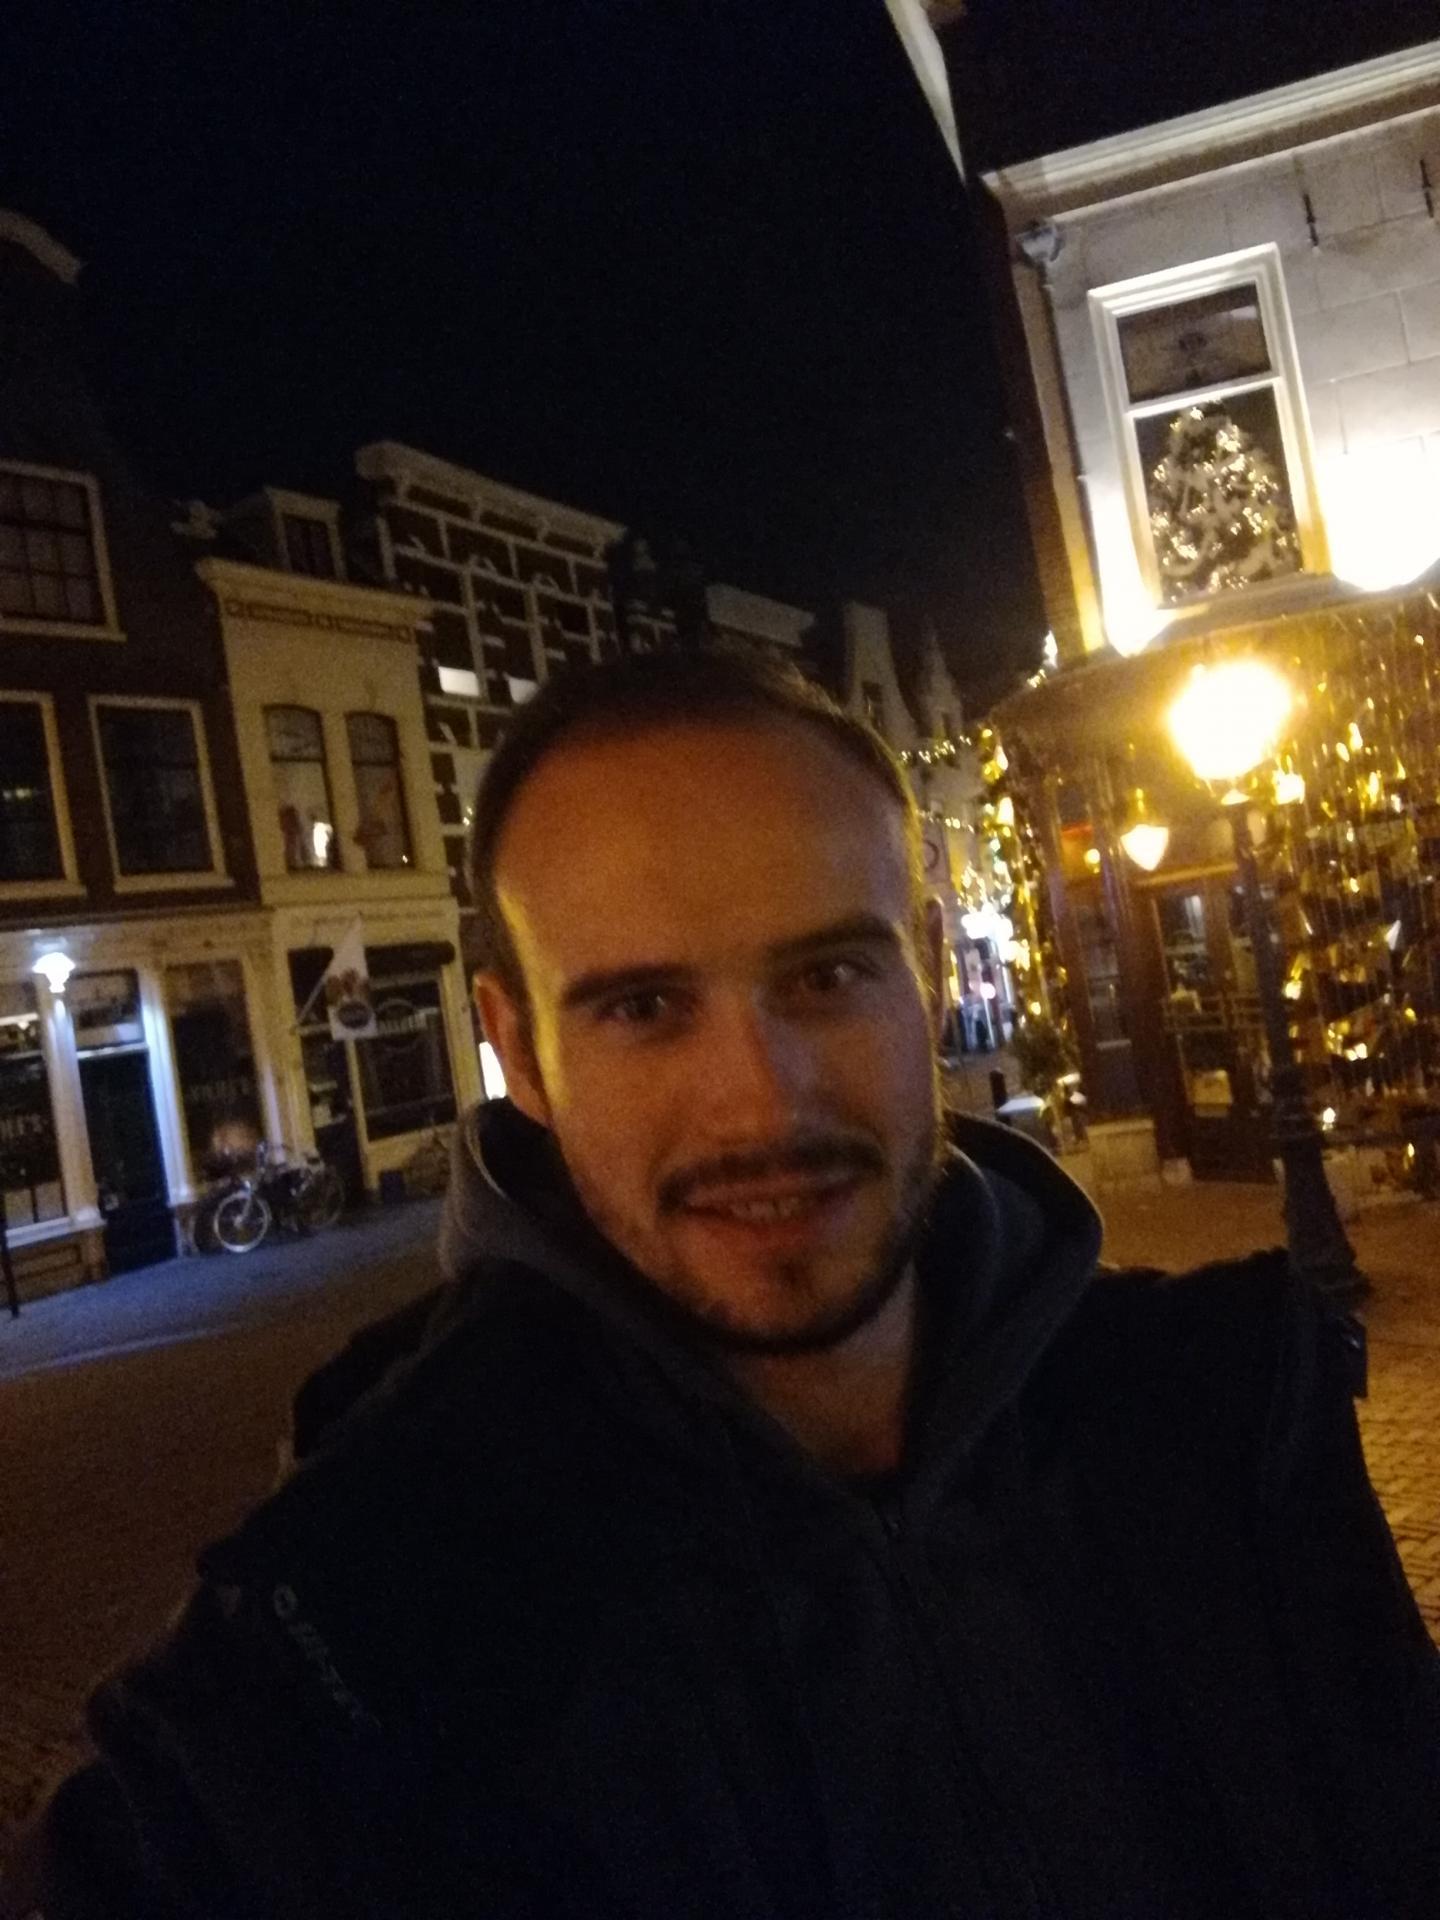 Broody uit Zuid-Holland,Nederland